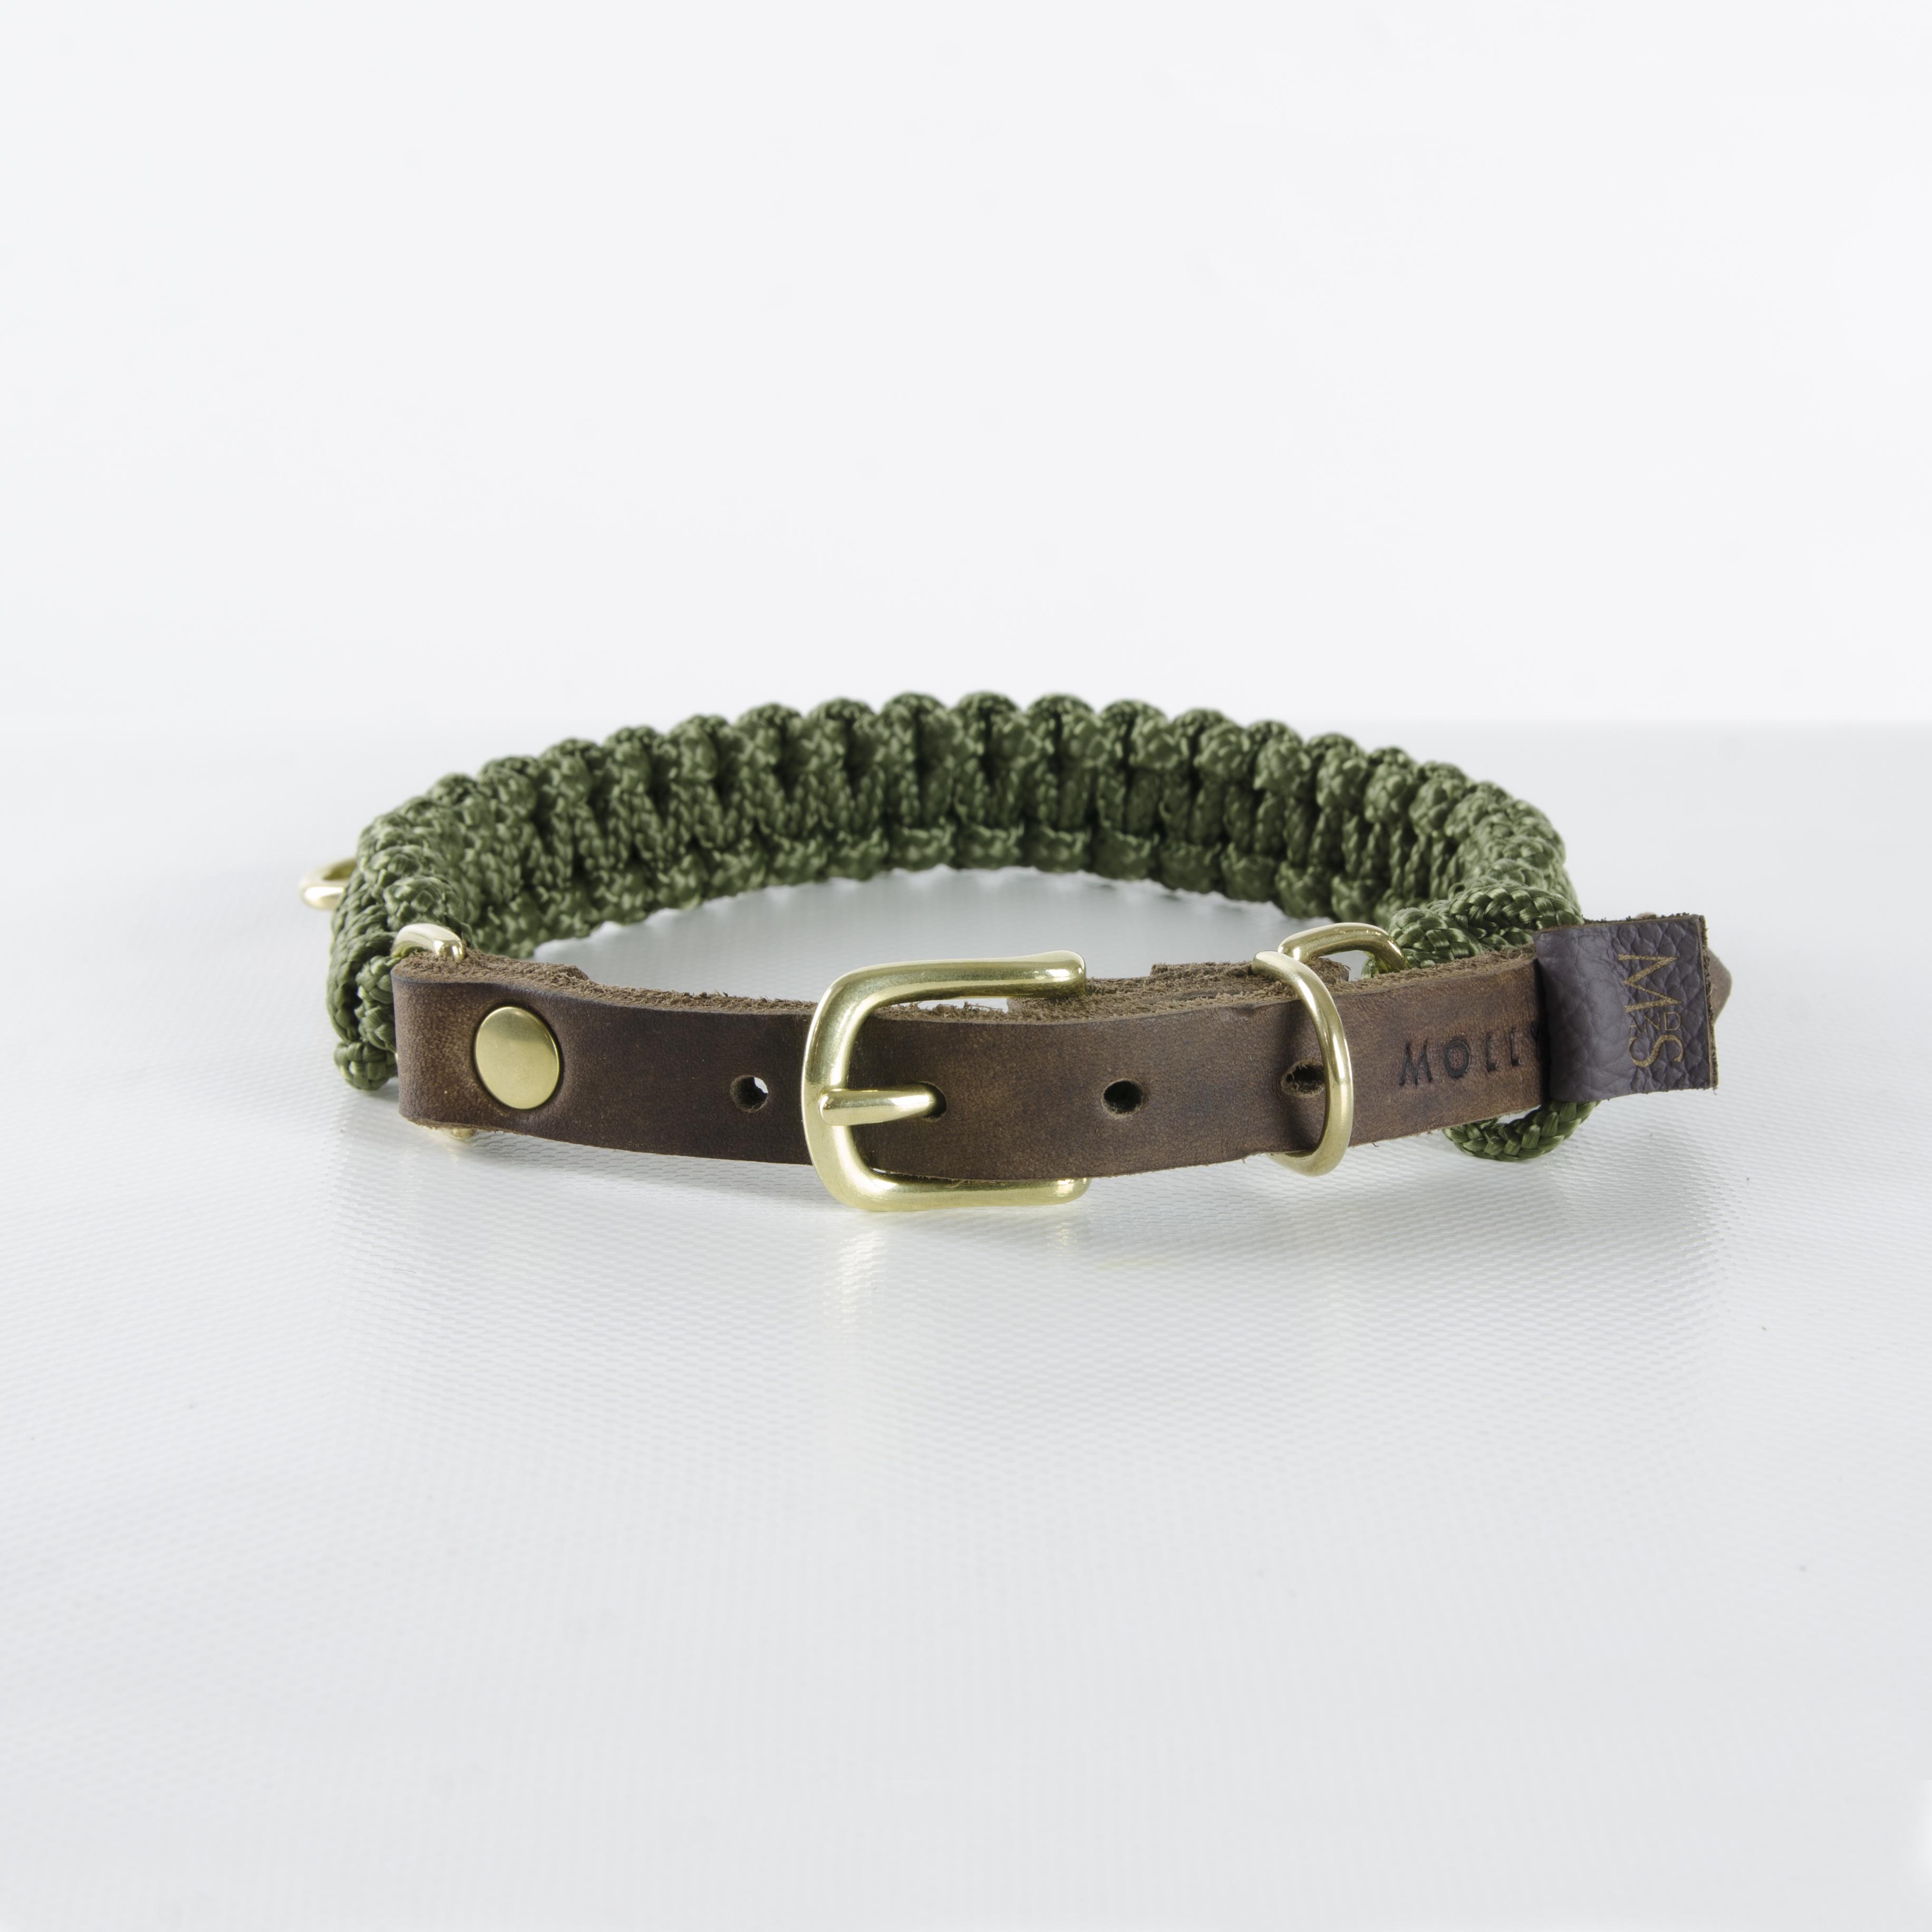 Hundehalsband TOL Gold Military (2)